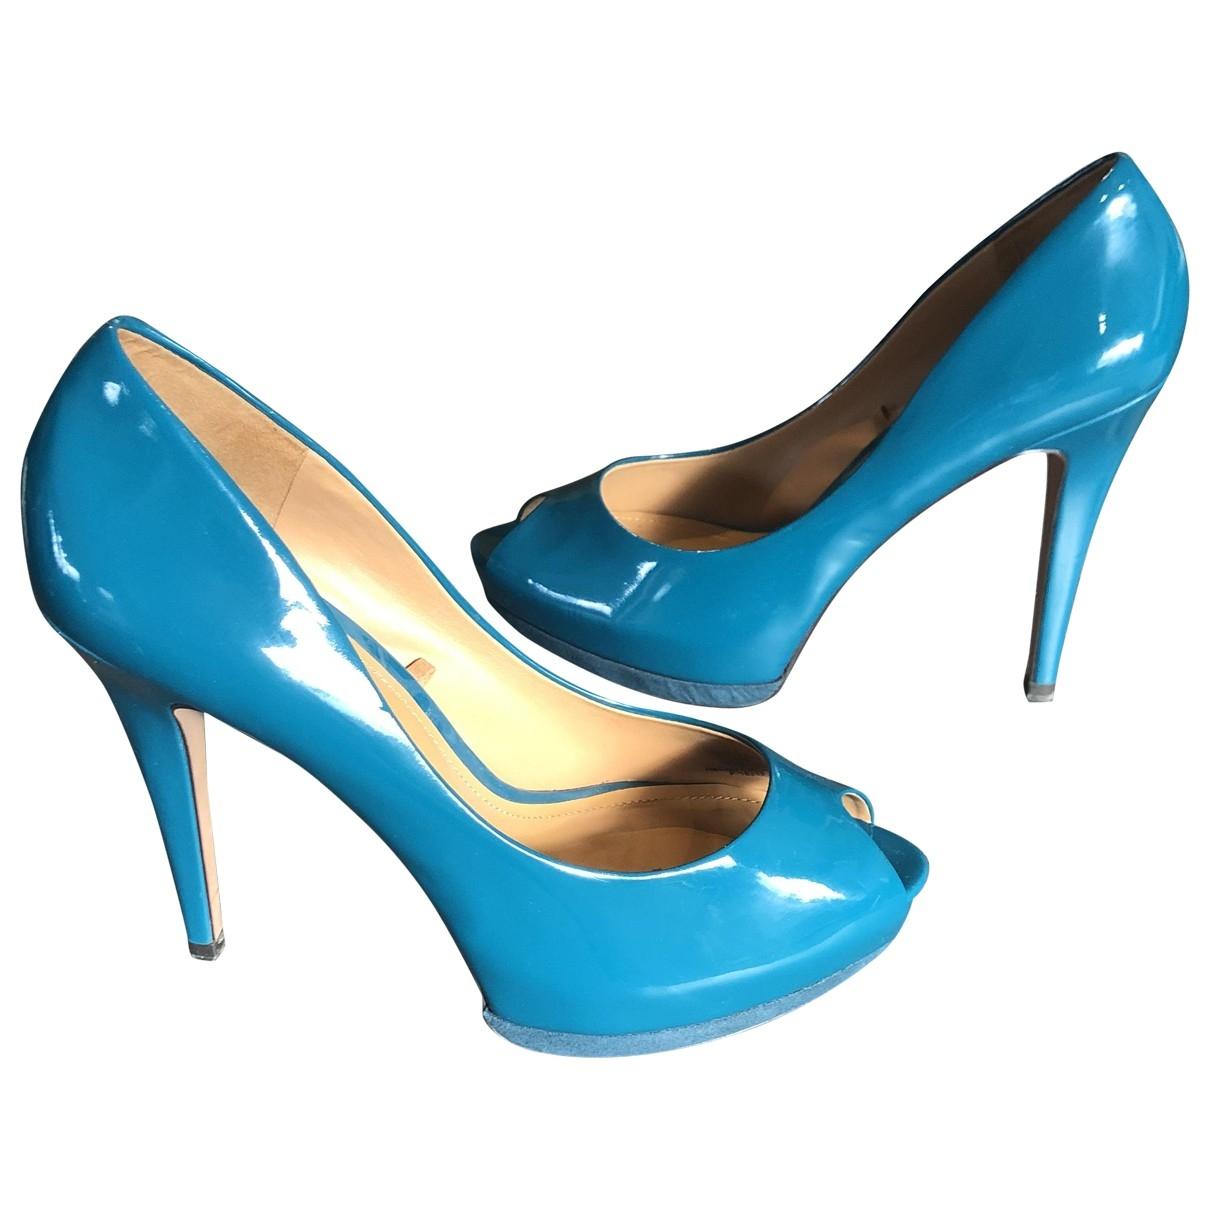 Zara \N Turquoise Patent leather Heels for Women 40 EU